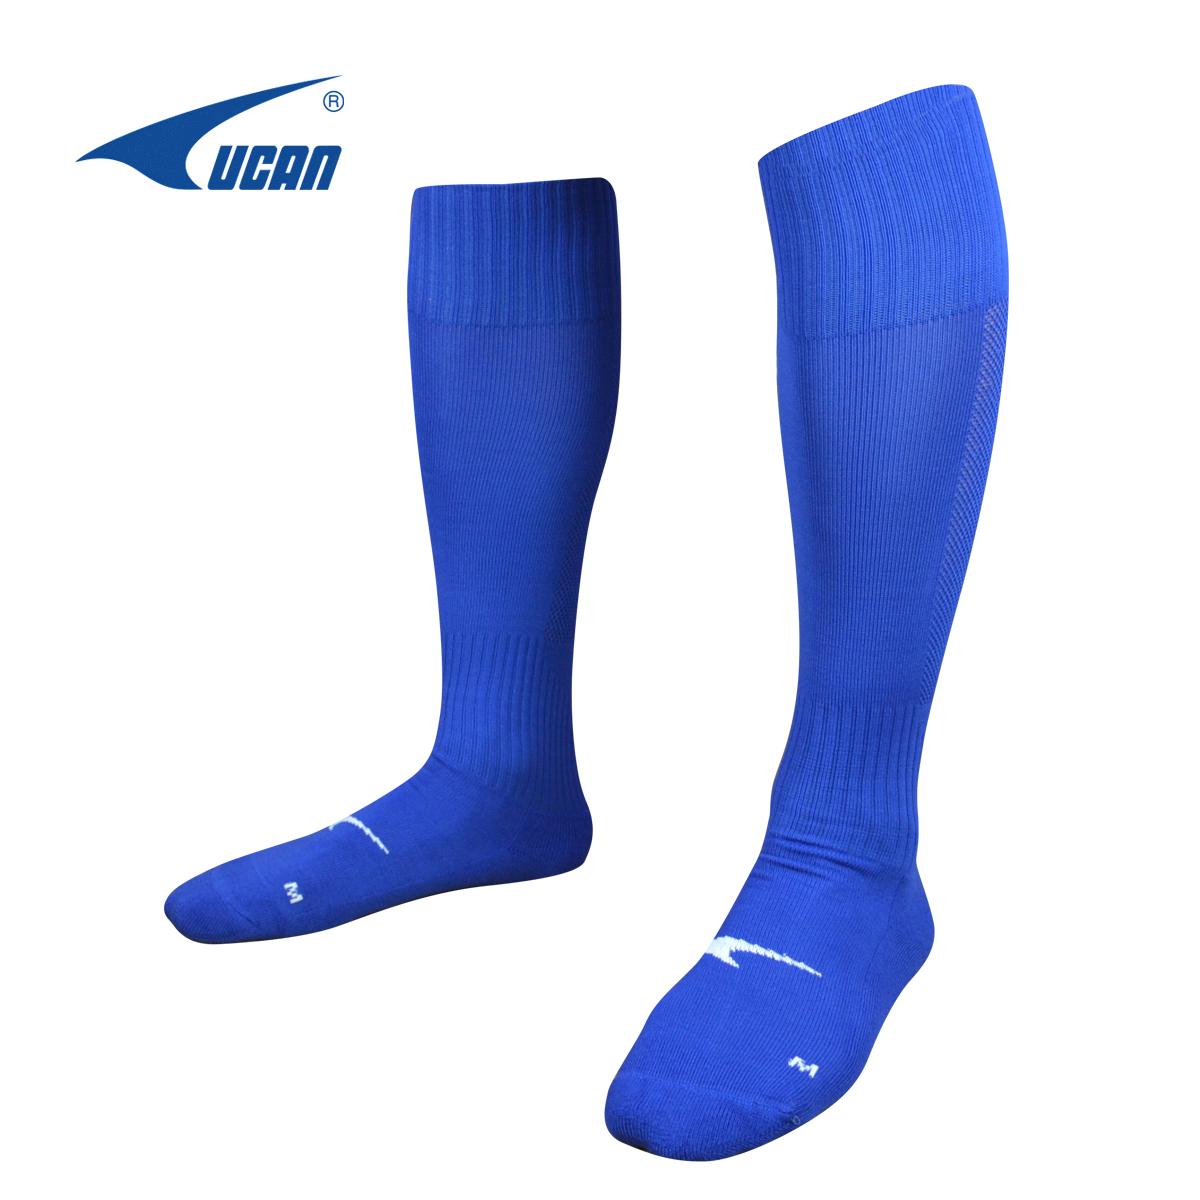 UCAN 銳克足球襪 長筒 過膝 加厚 防滑導汗專業足球襪A07233